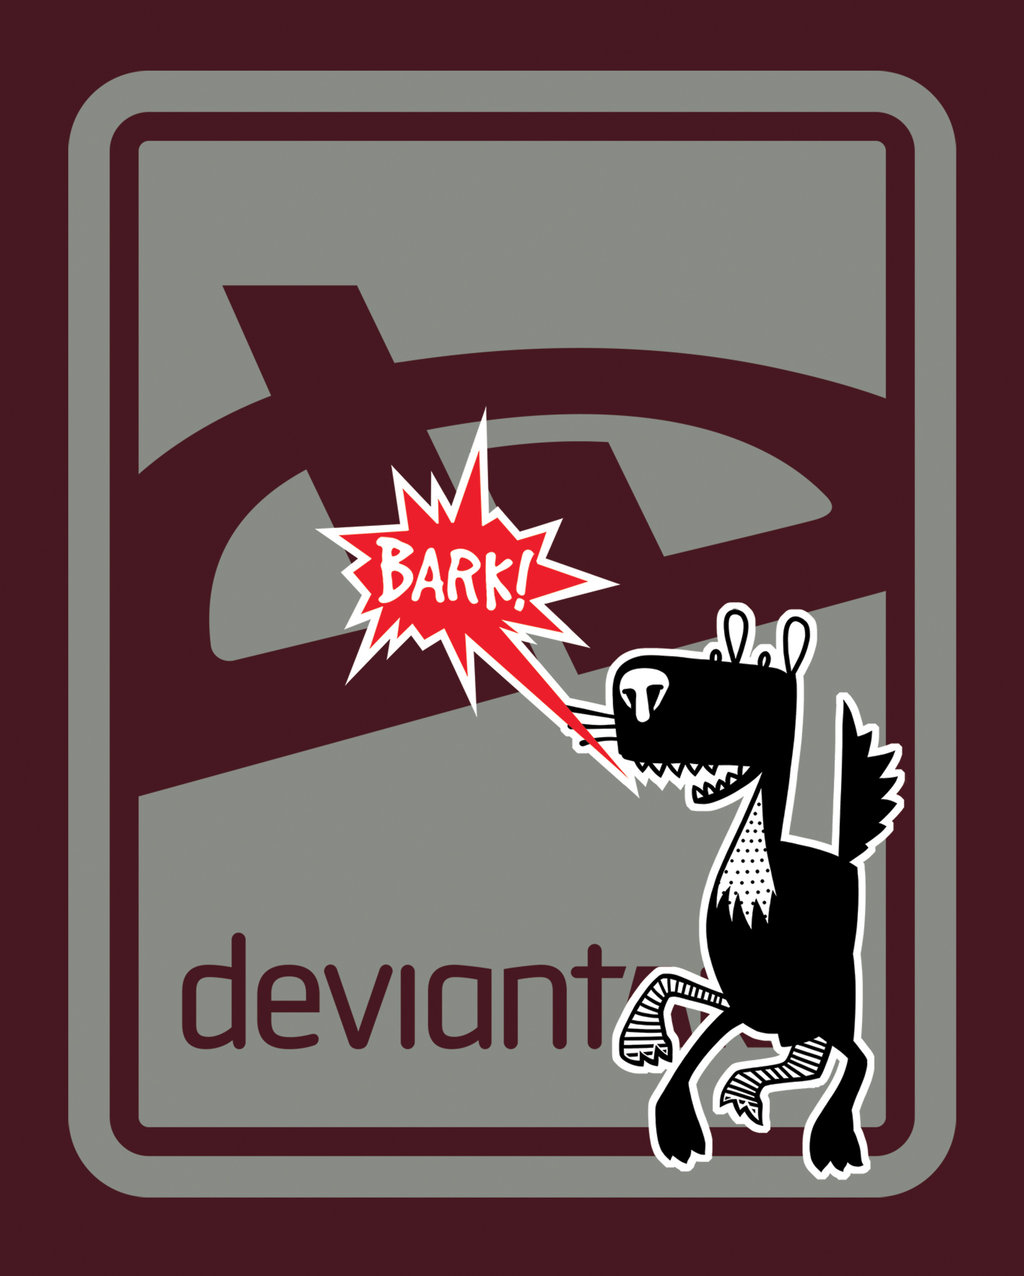 deviant BARK T-Shirt - Brick by deviantARTGear